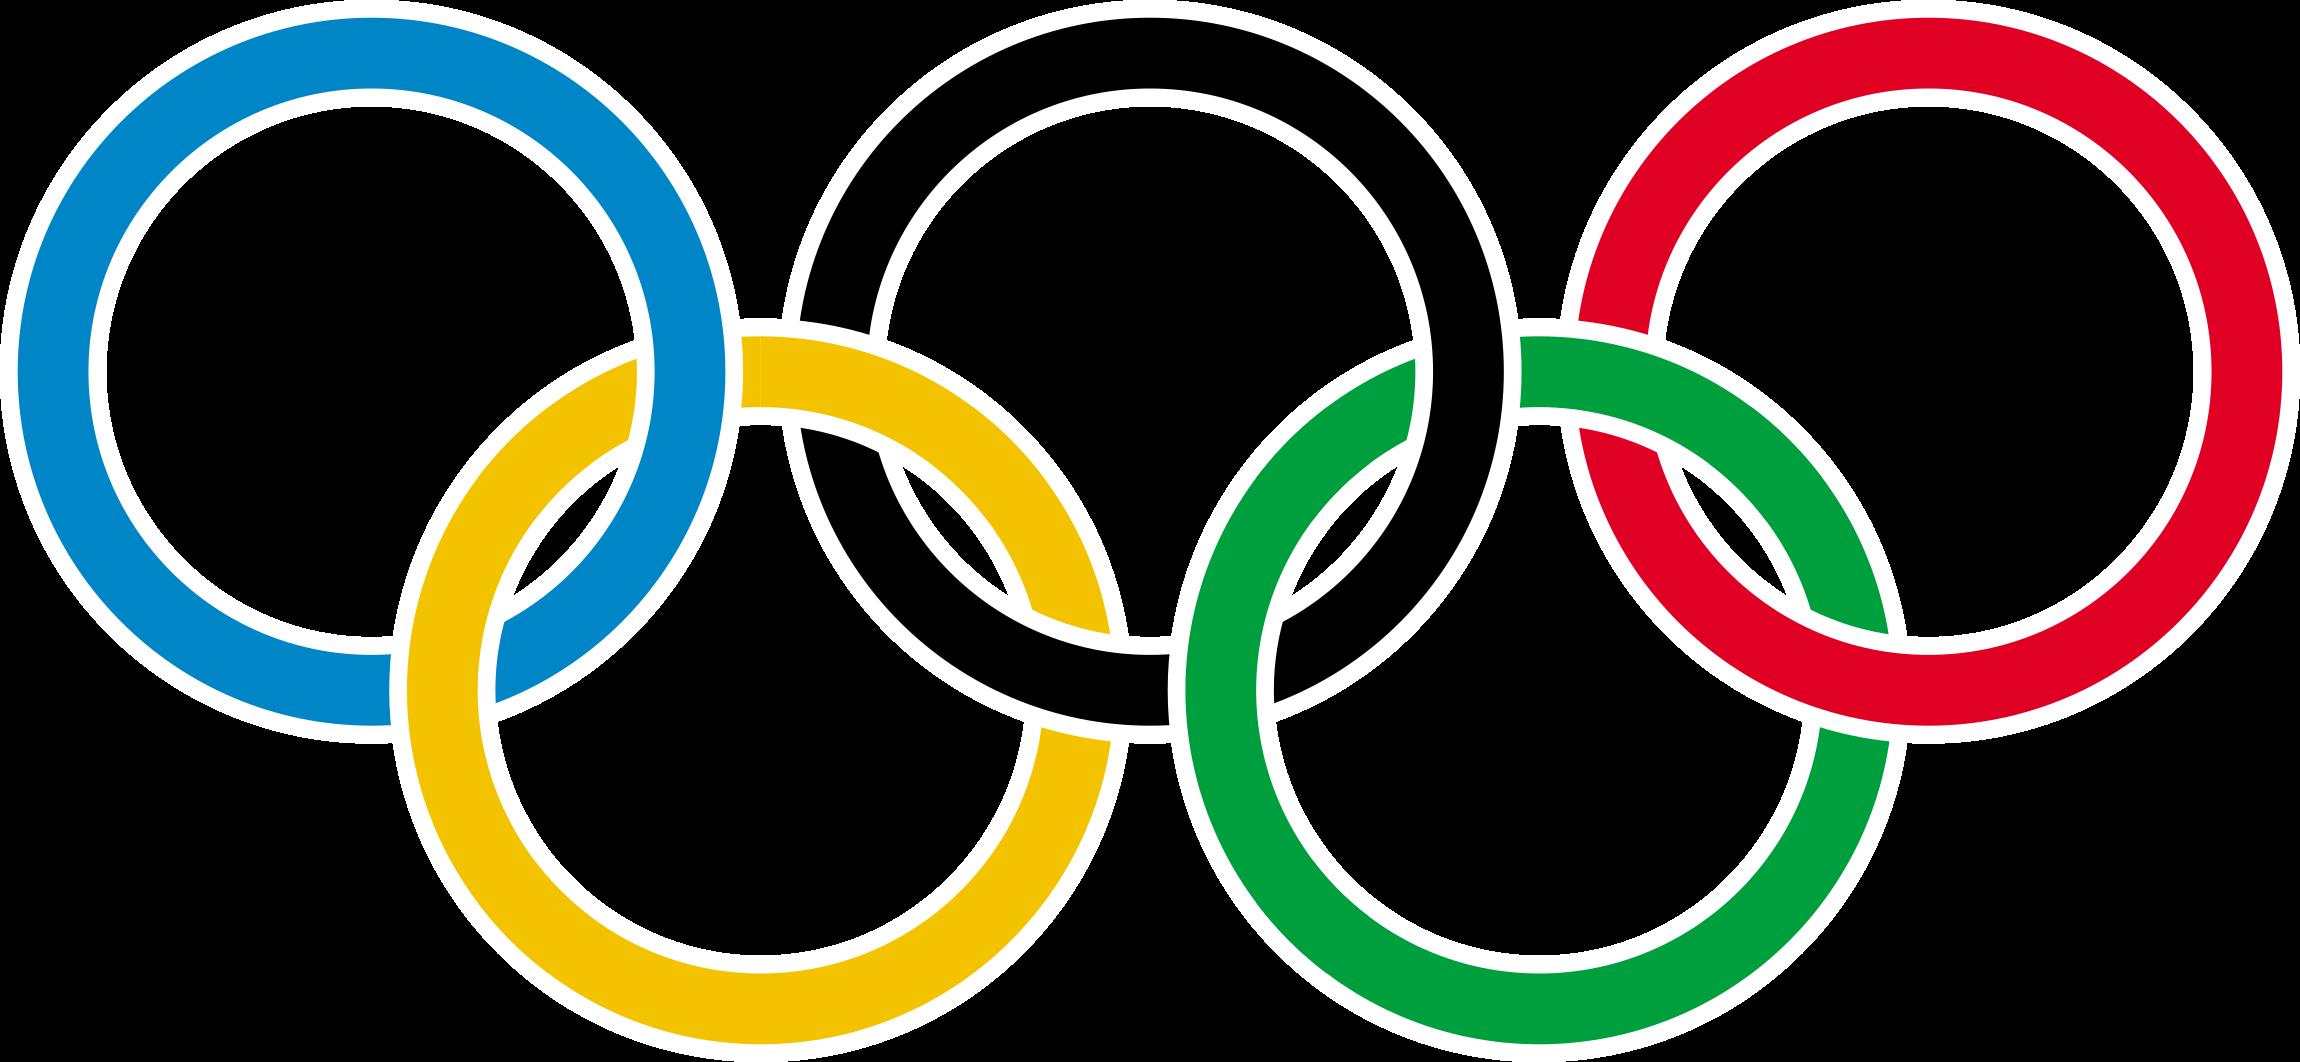 anel-olimpico-olimpiadas-1